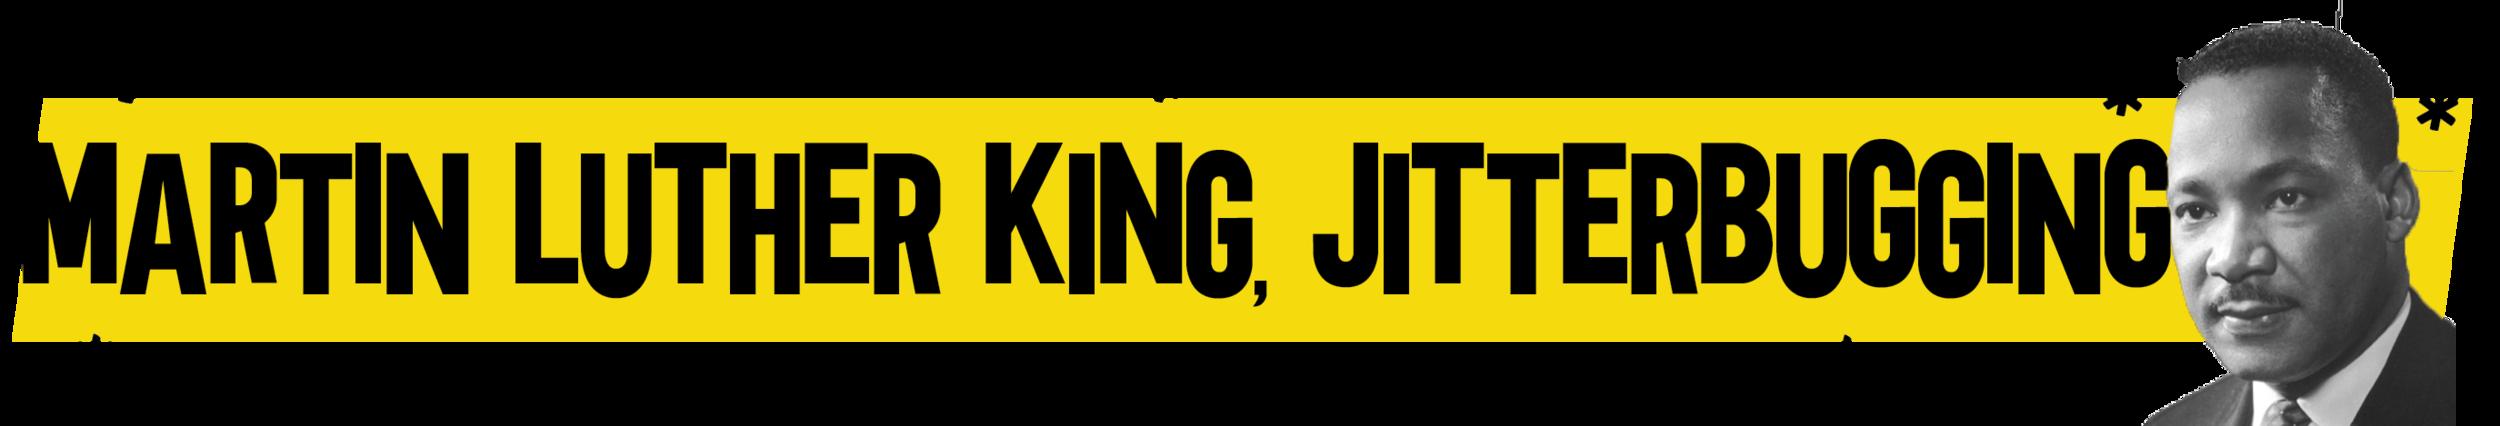 jitterbug-subs-4.png